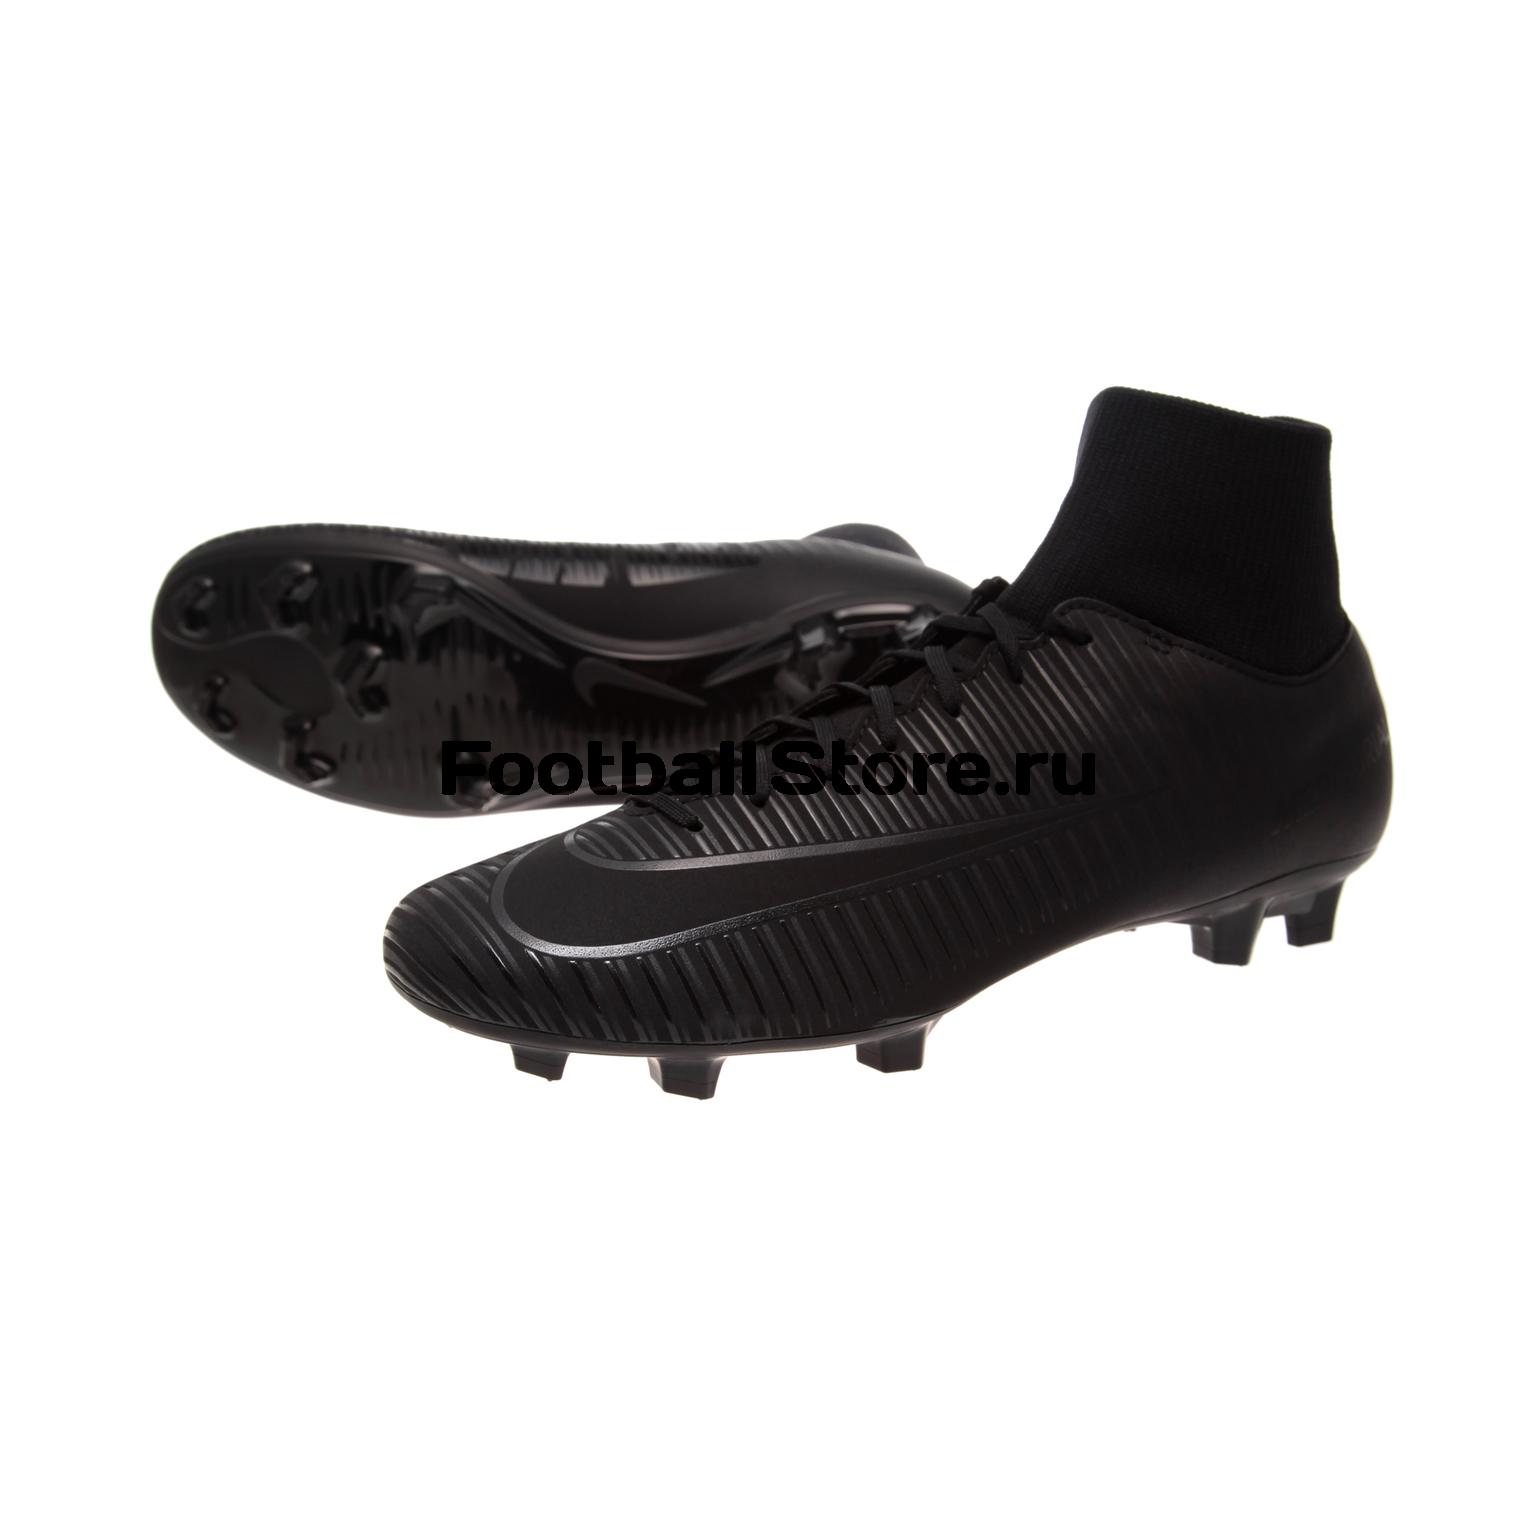 Игровые бутсы Nike Бутсы Nike Mercurial Victory VI DF FG 903609-001 nike nike mercurial lite